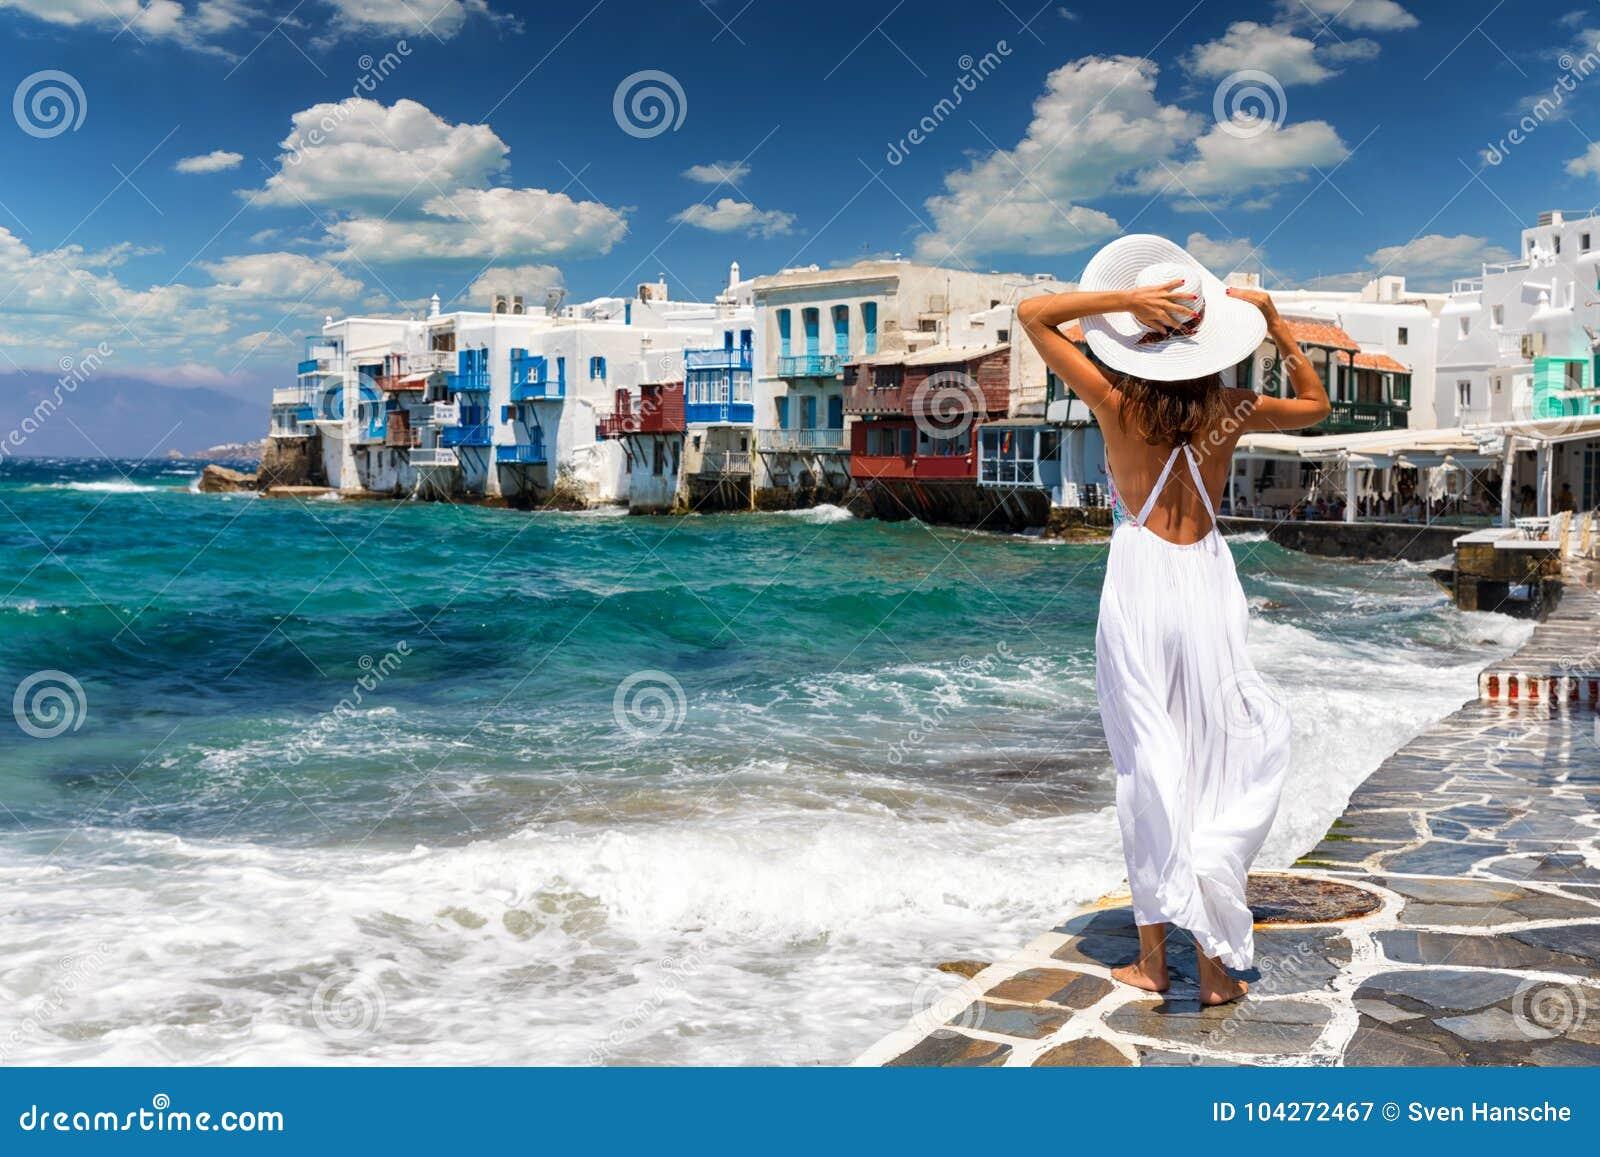 Attractive female tourist in famous Little Venice on Mykonos island, Greece